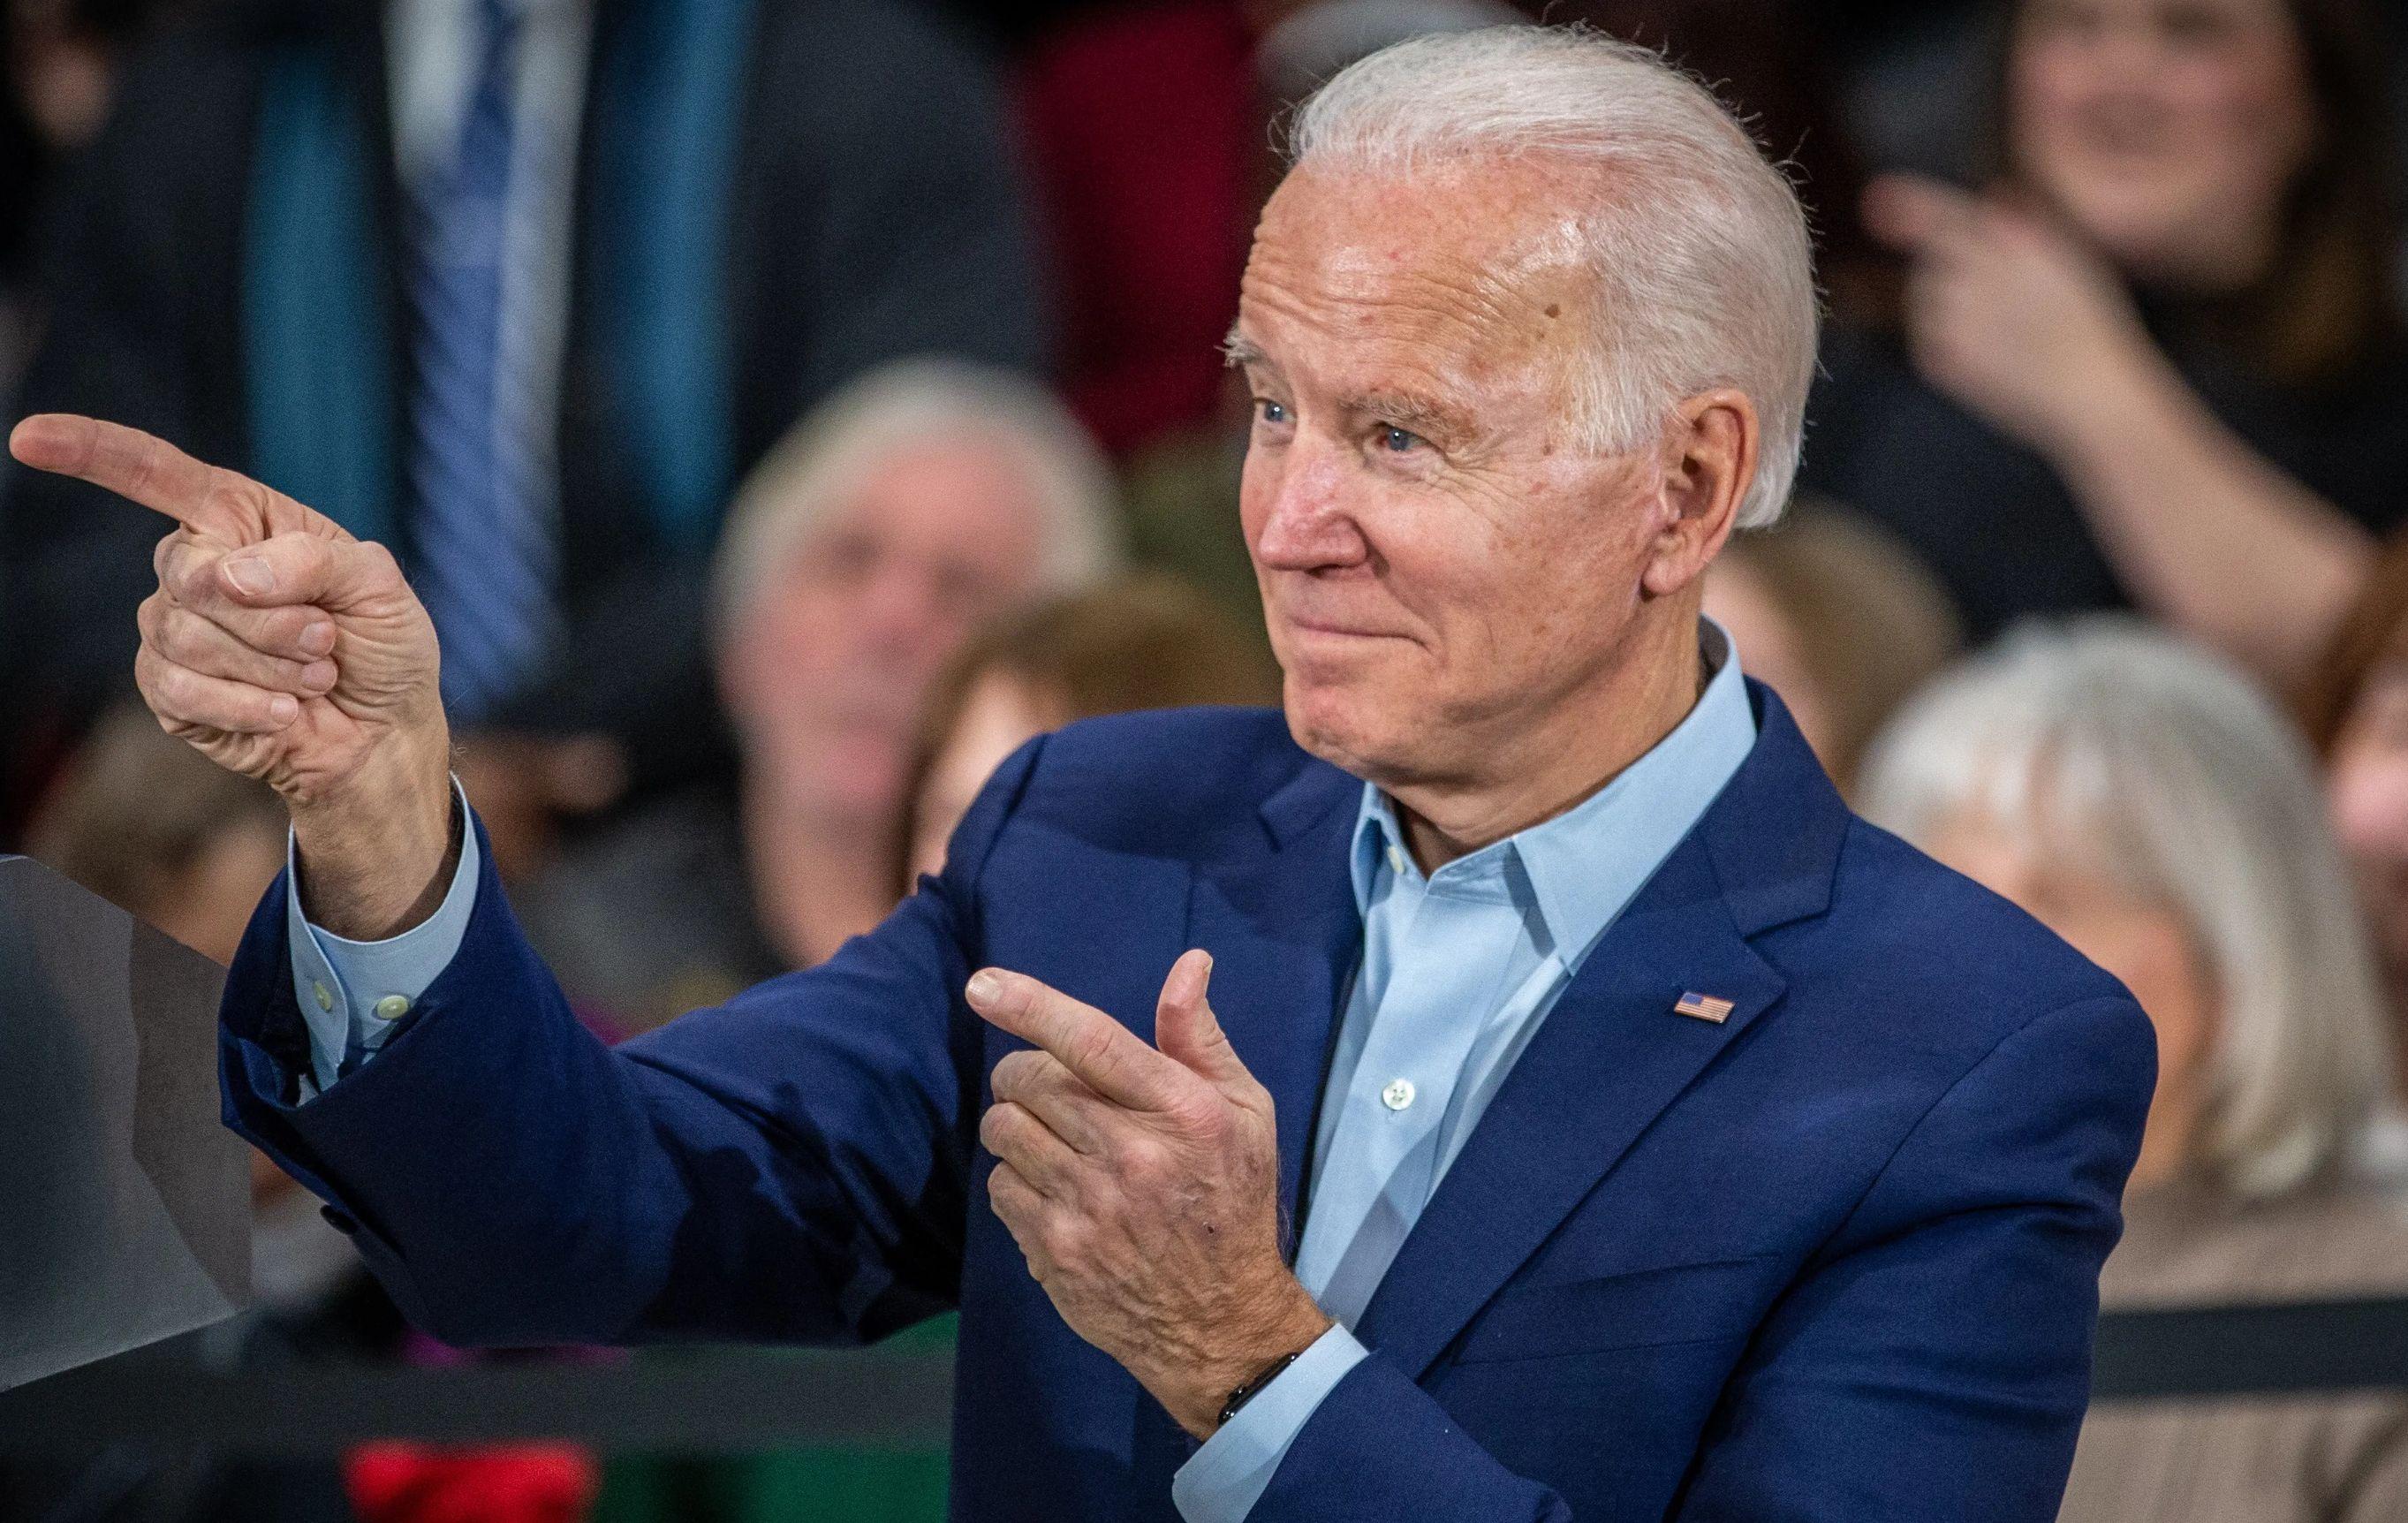 President Joe Biden holds a campaign rally.